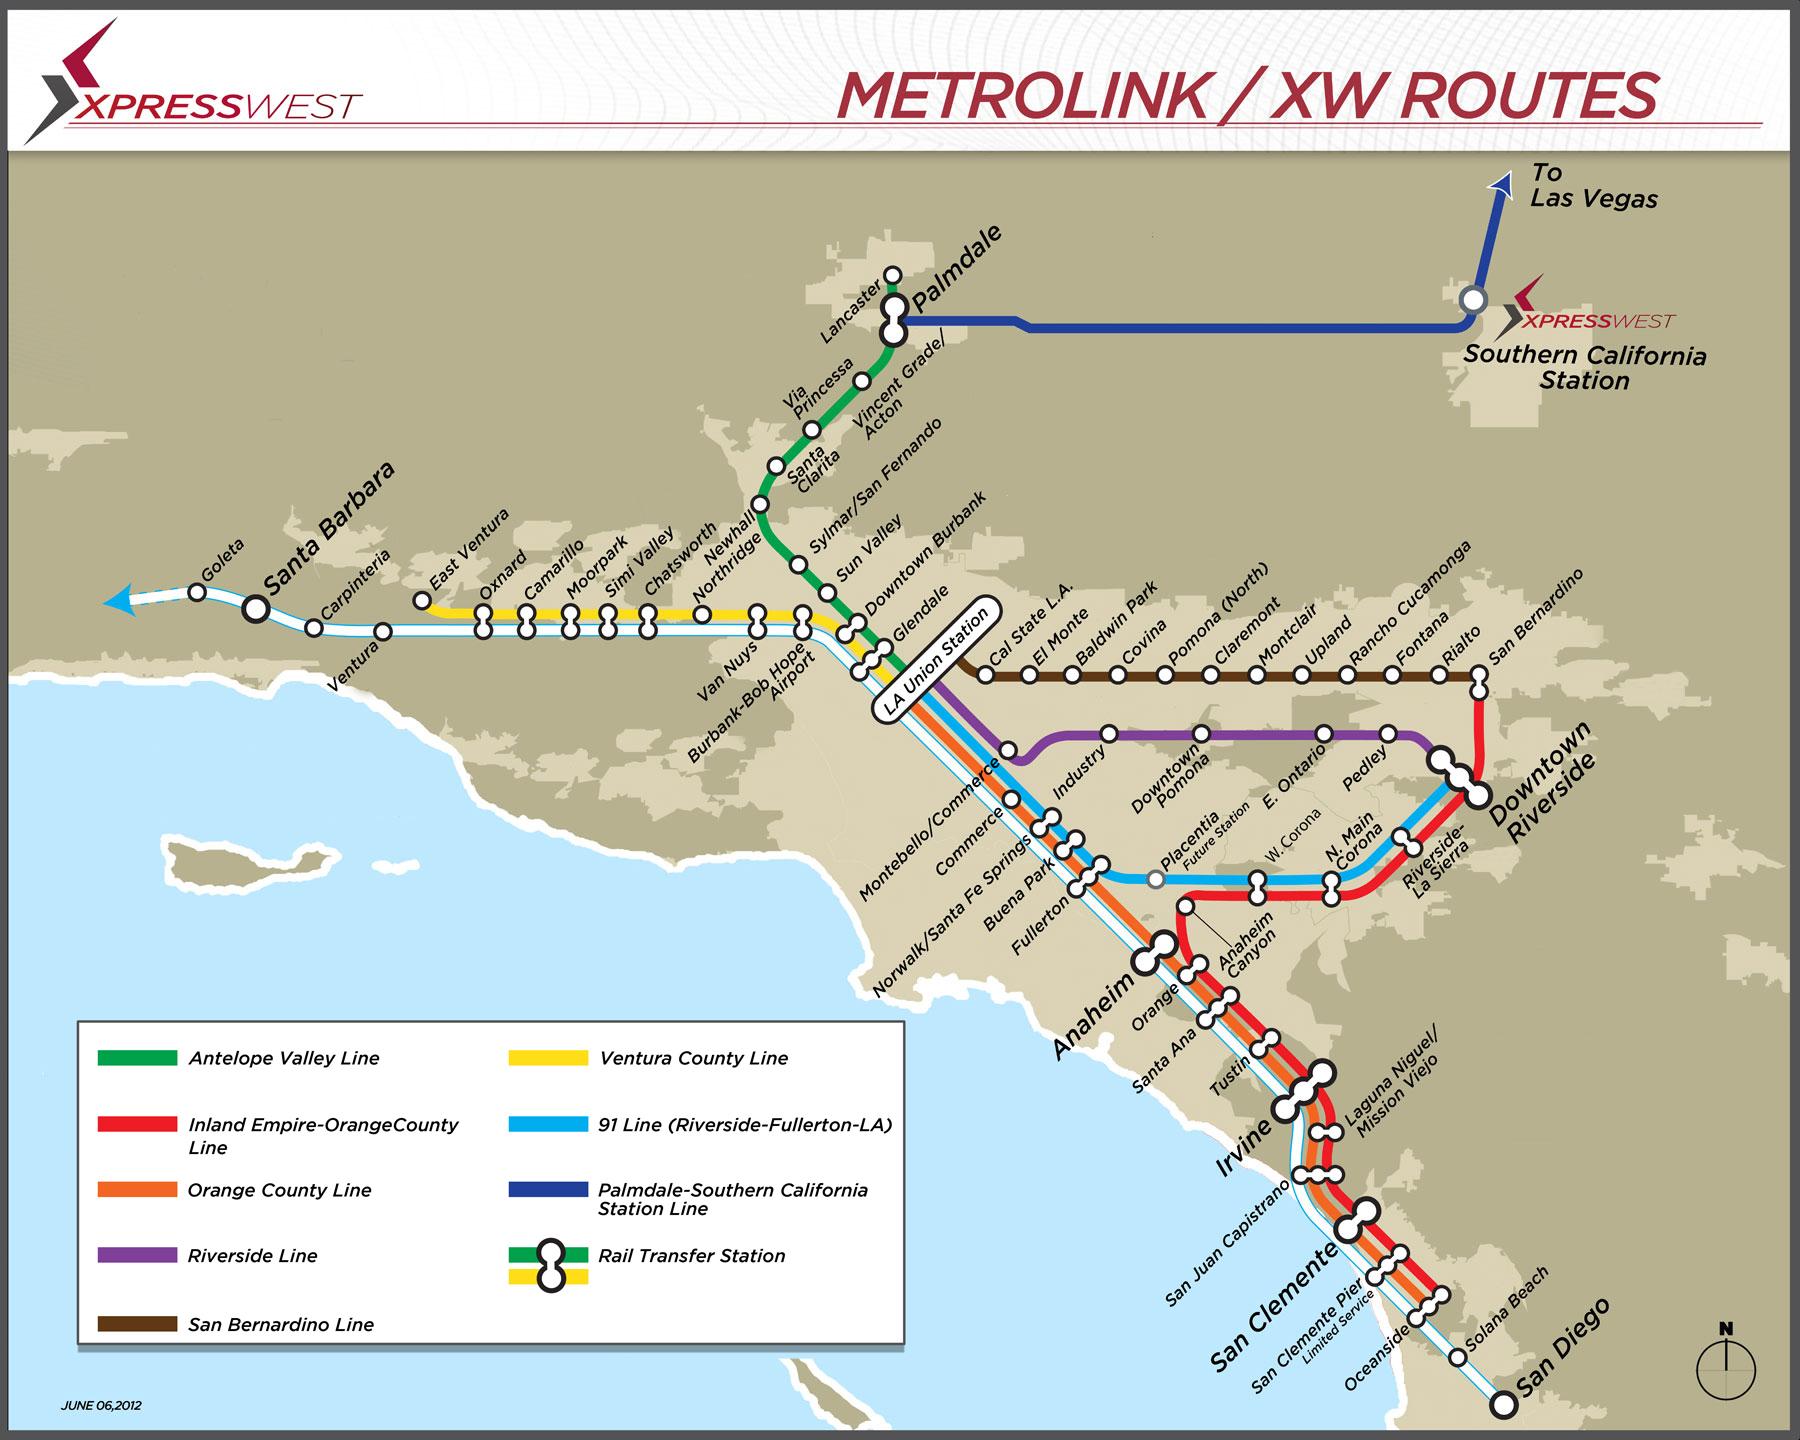 Expansion Map California Southern California Railroad Map California - Southern California Train Map